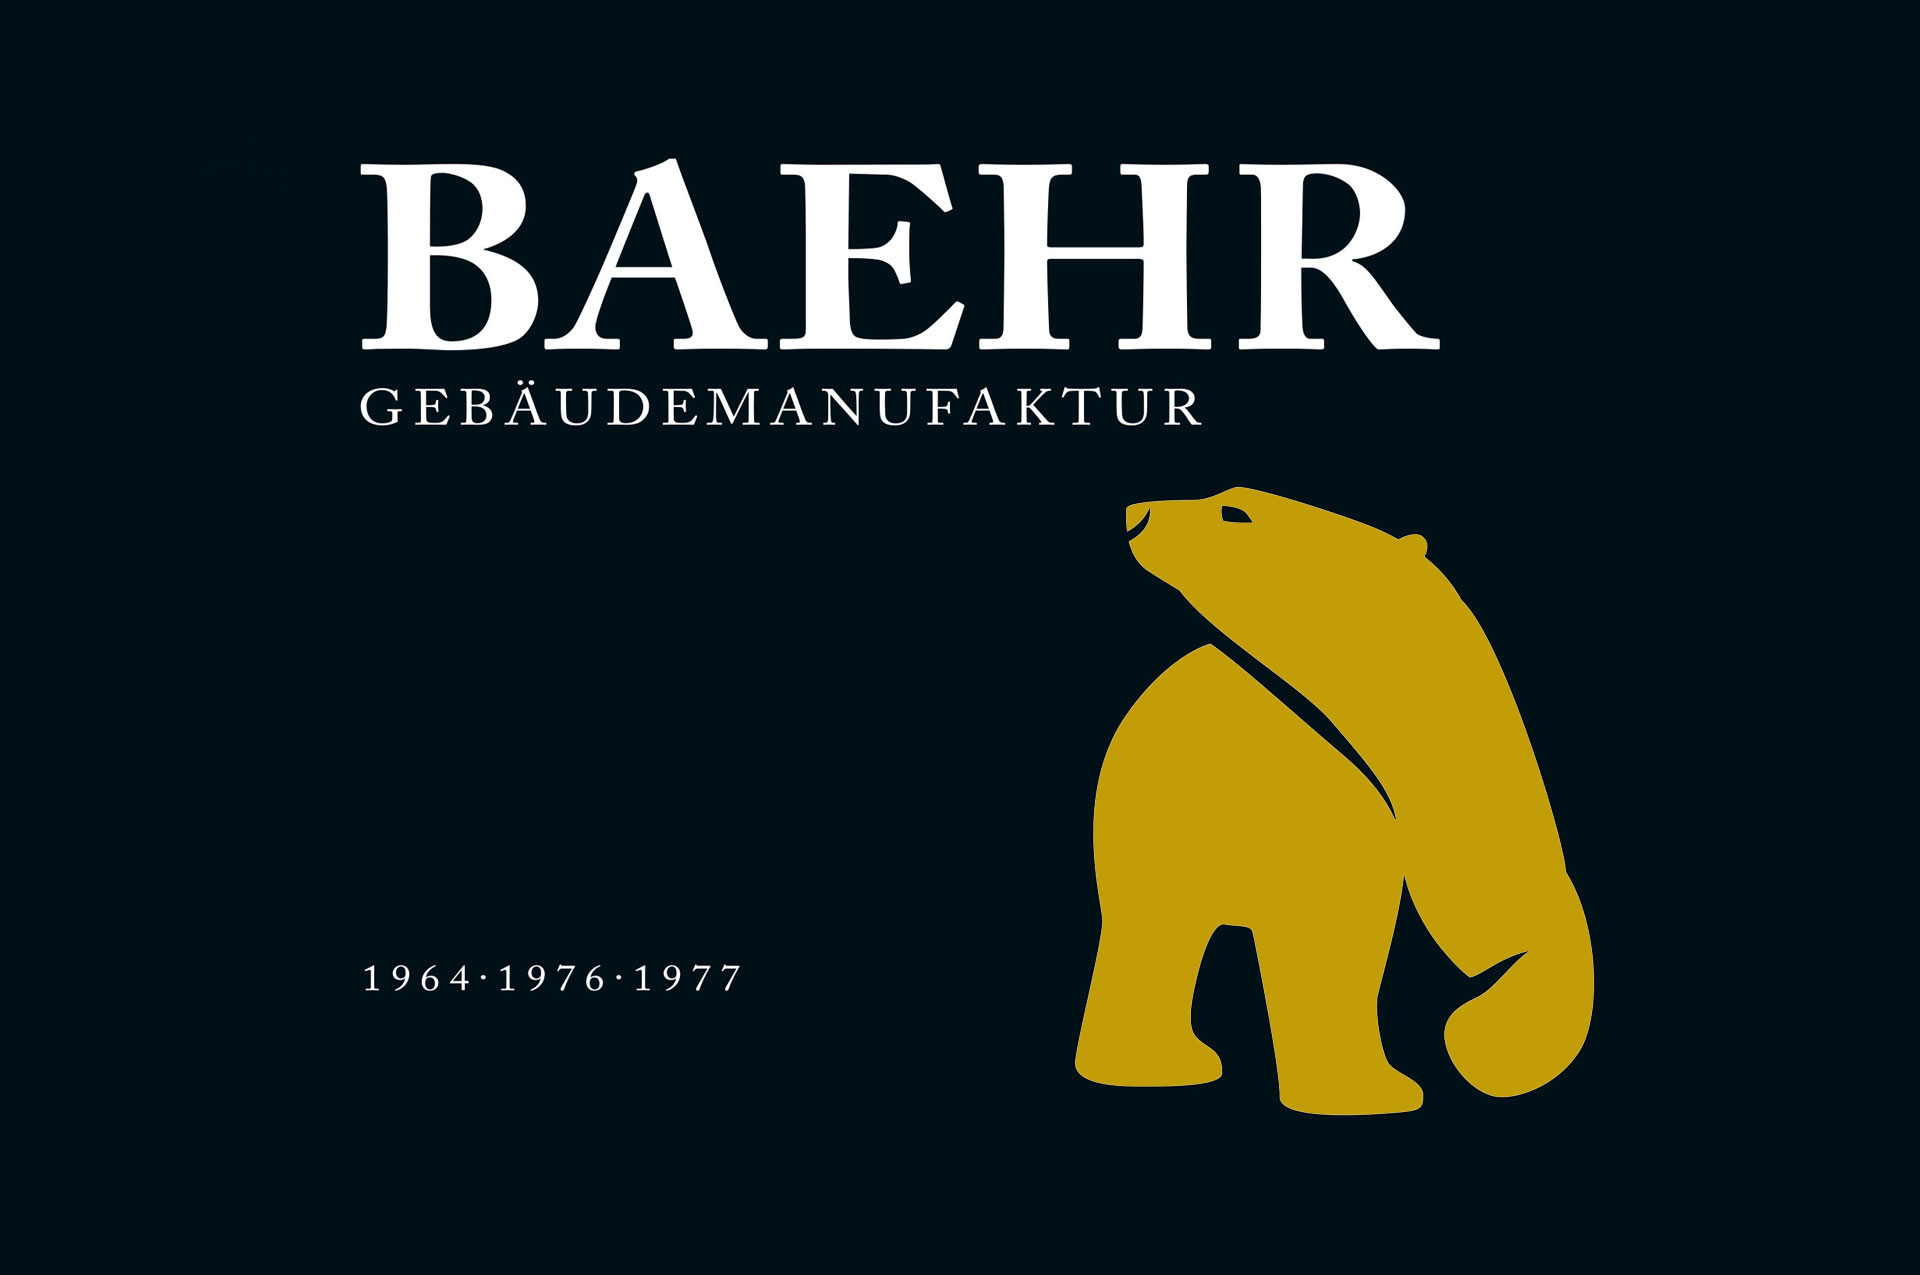 baehr-gebaeude-manufaktur